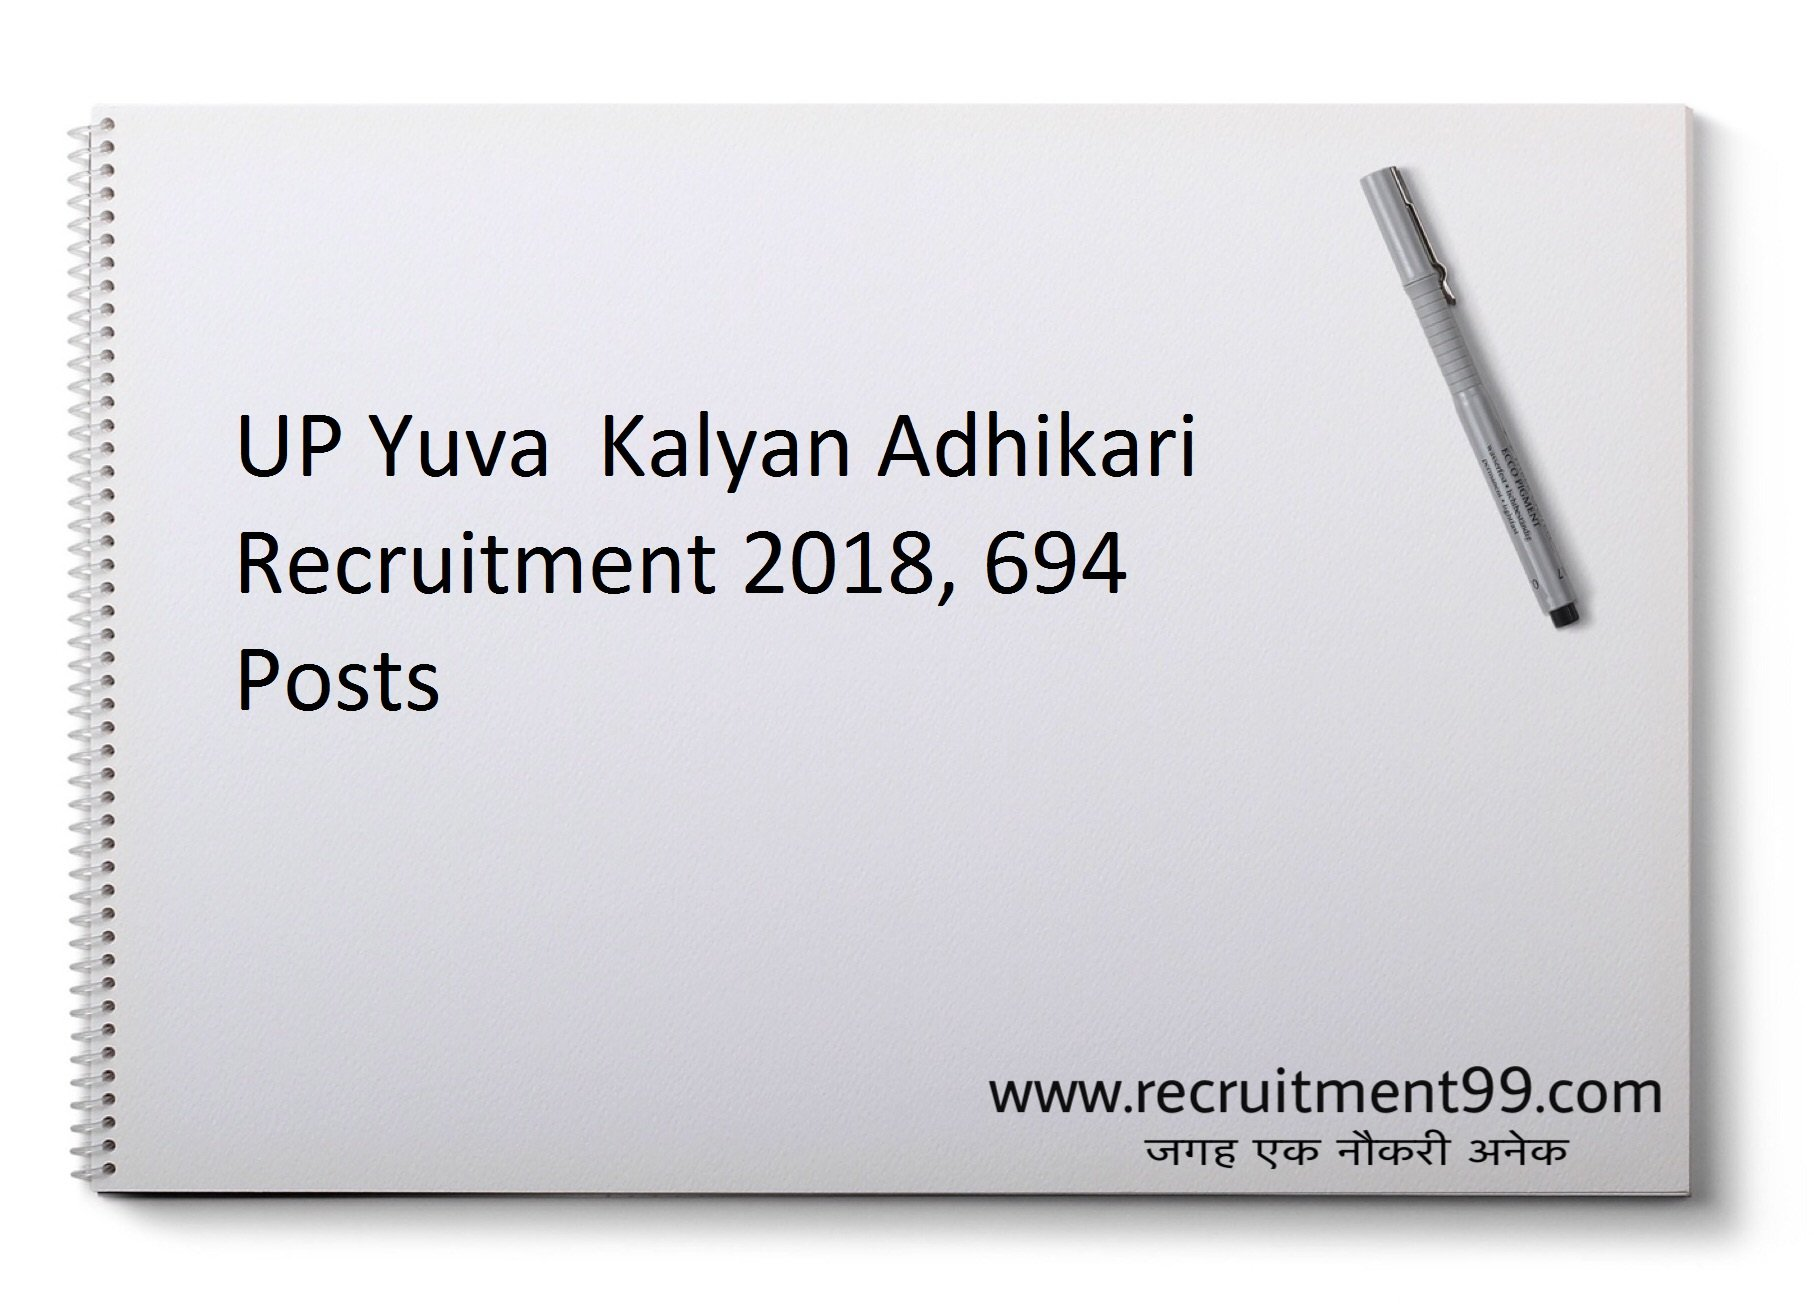 UPSSSC yuva kalyan adhikari recruitment, Admit card & Result